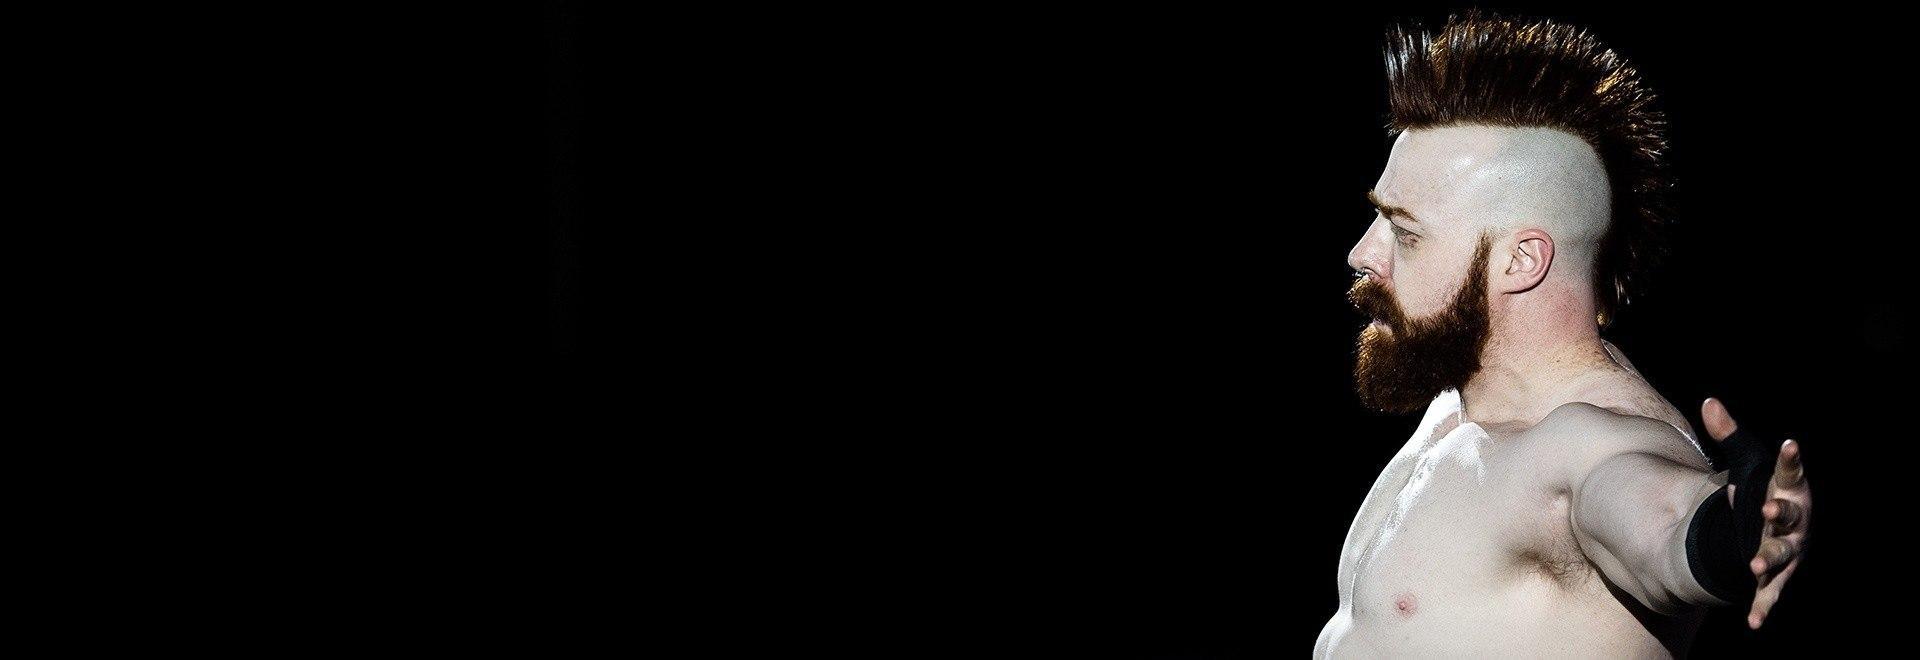 Ep. 245